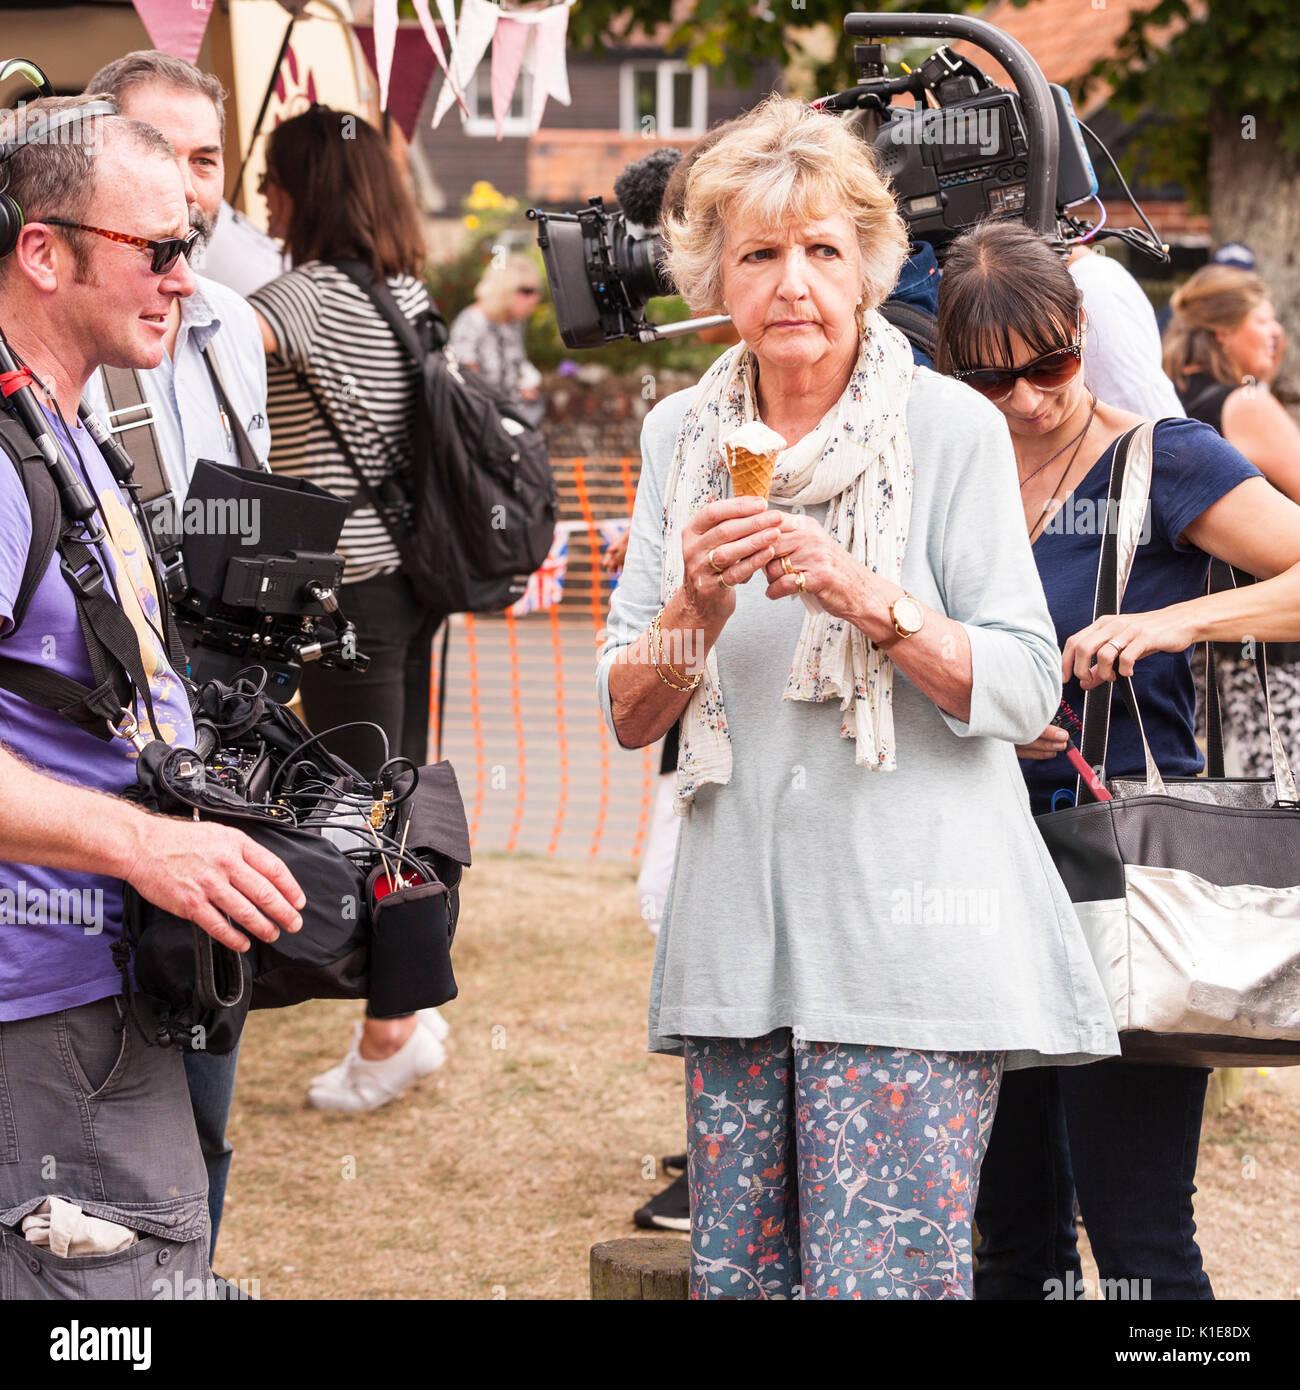 Walberswick, Suffolk, England, Uk. 26th August 2017. Penelope Keith filming at Walberswick village fete. Tim Oram/Alamy Live News - Stock Image